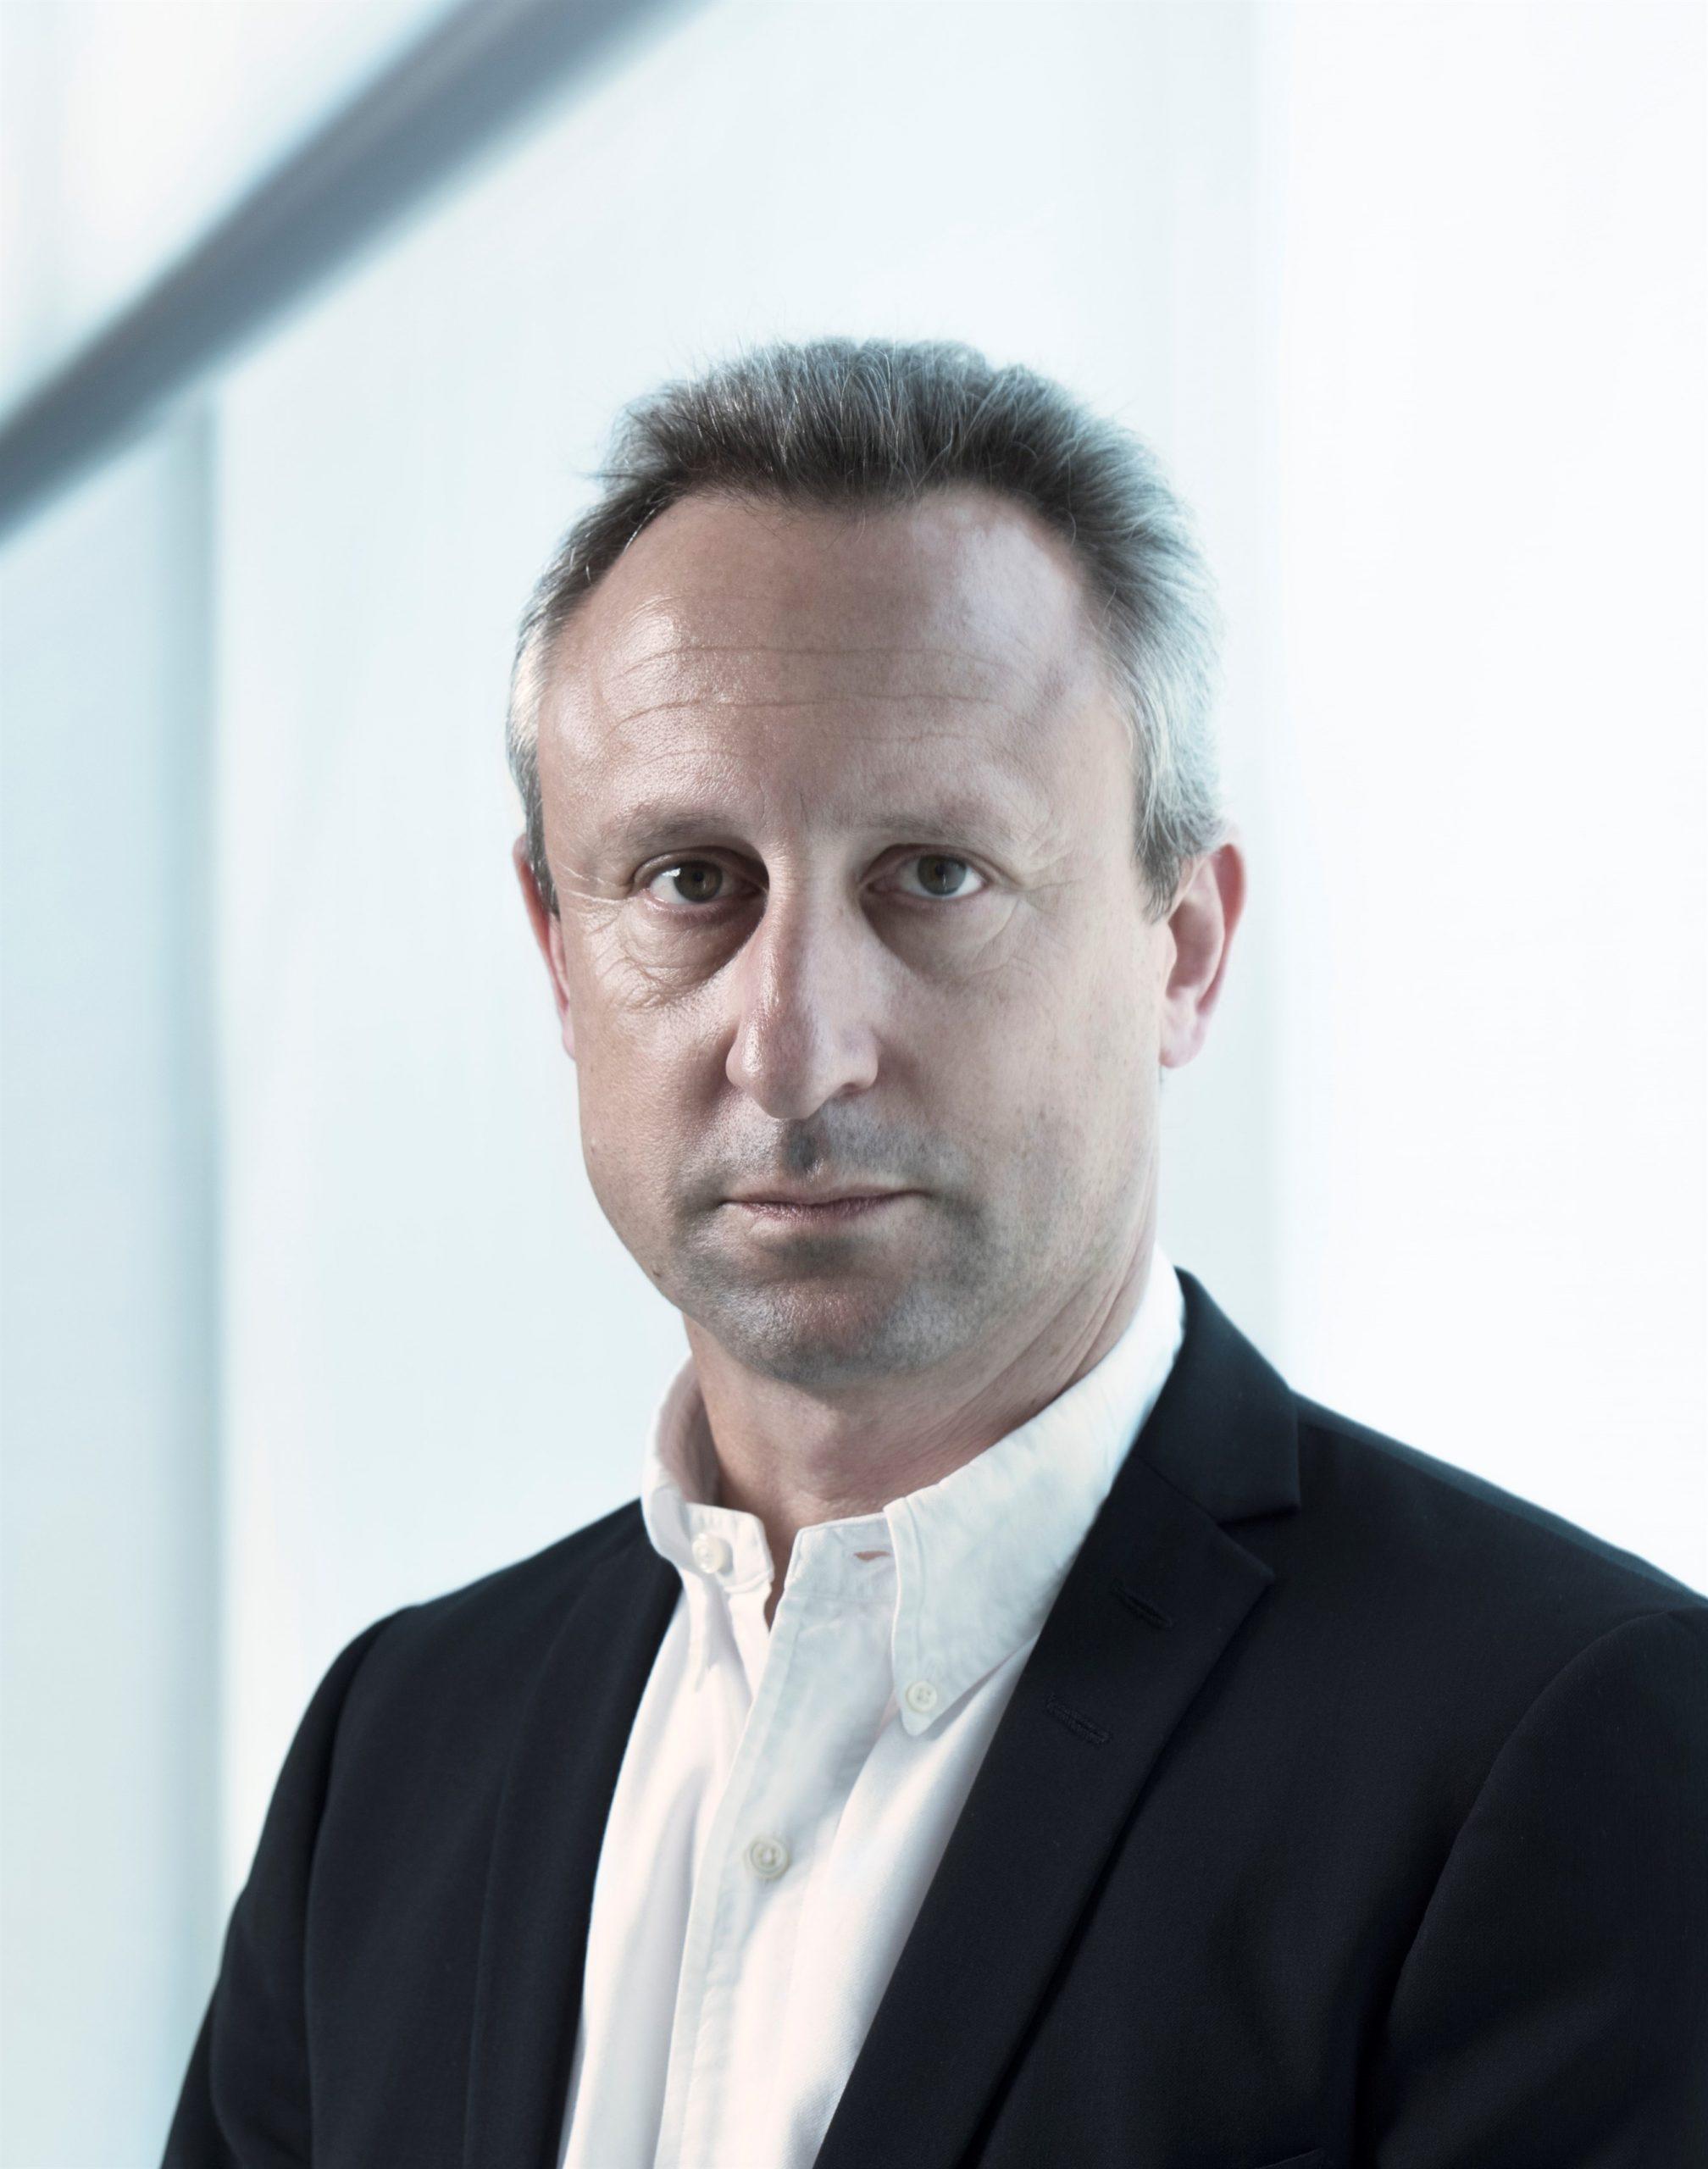 photograph of Jonathan Goodman the Chief Operating Officer Polestar UK